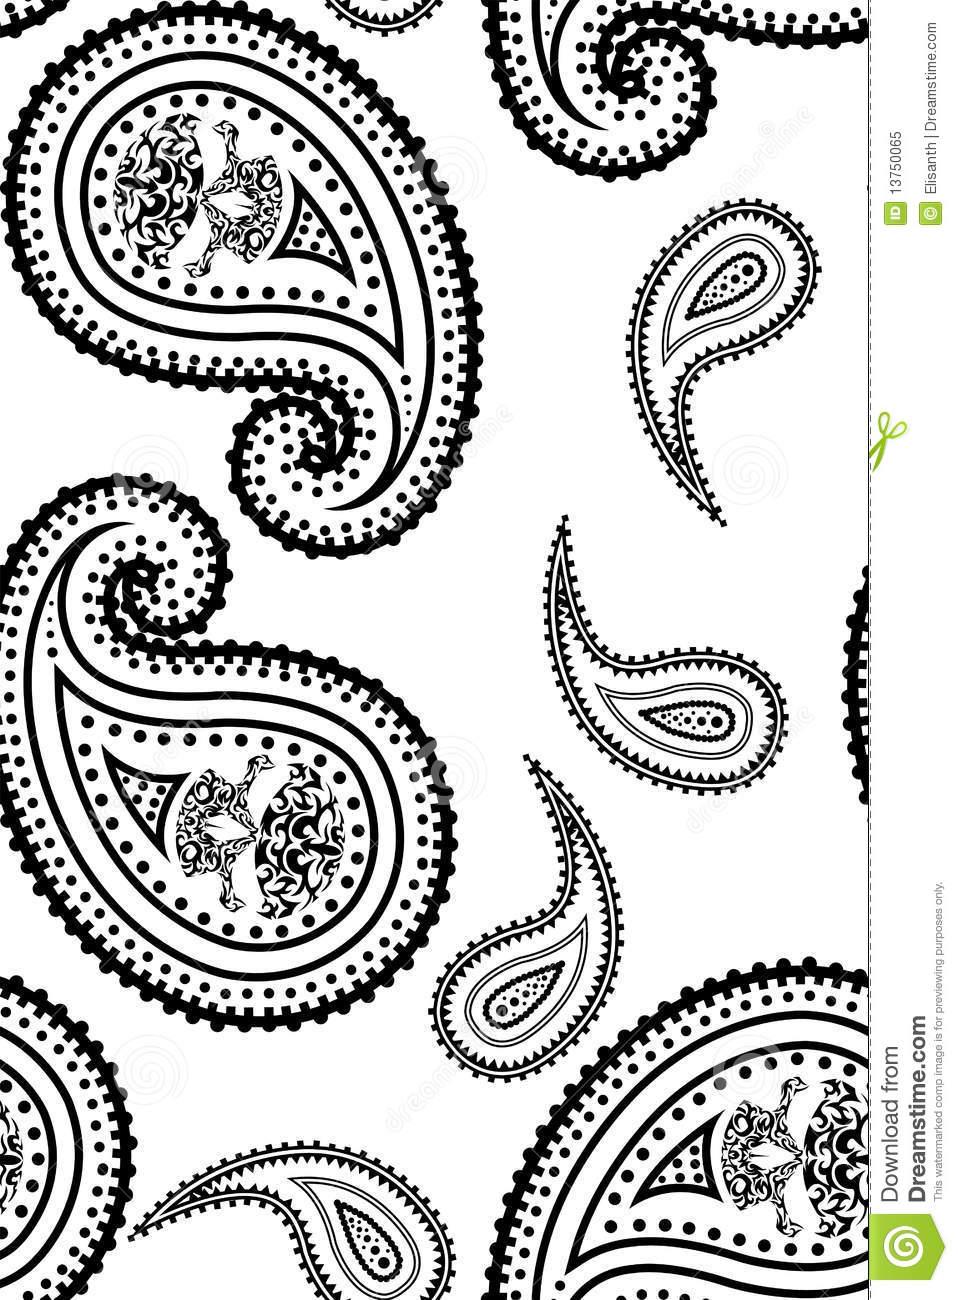 CLIP ART PAISLEY PATTERN - 233px Image #17